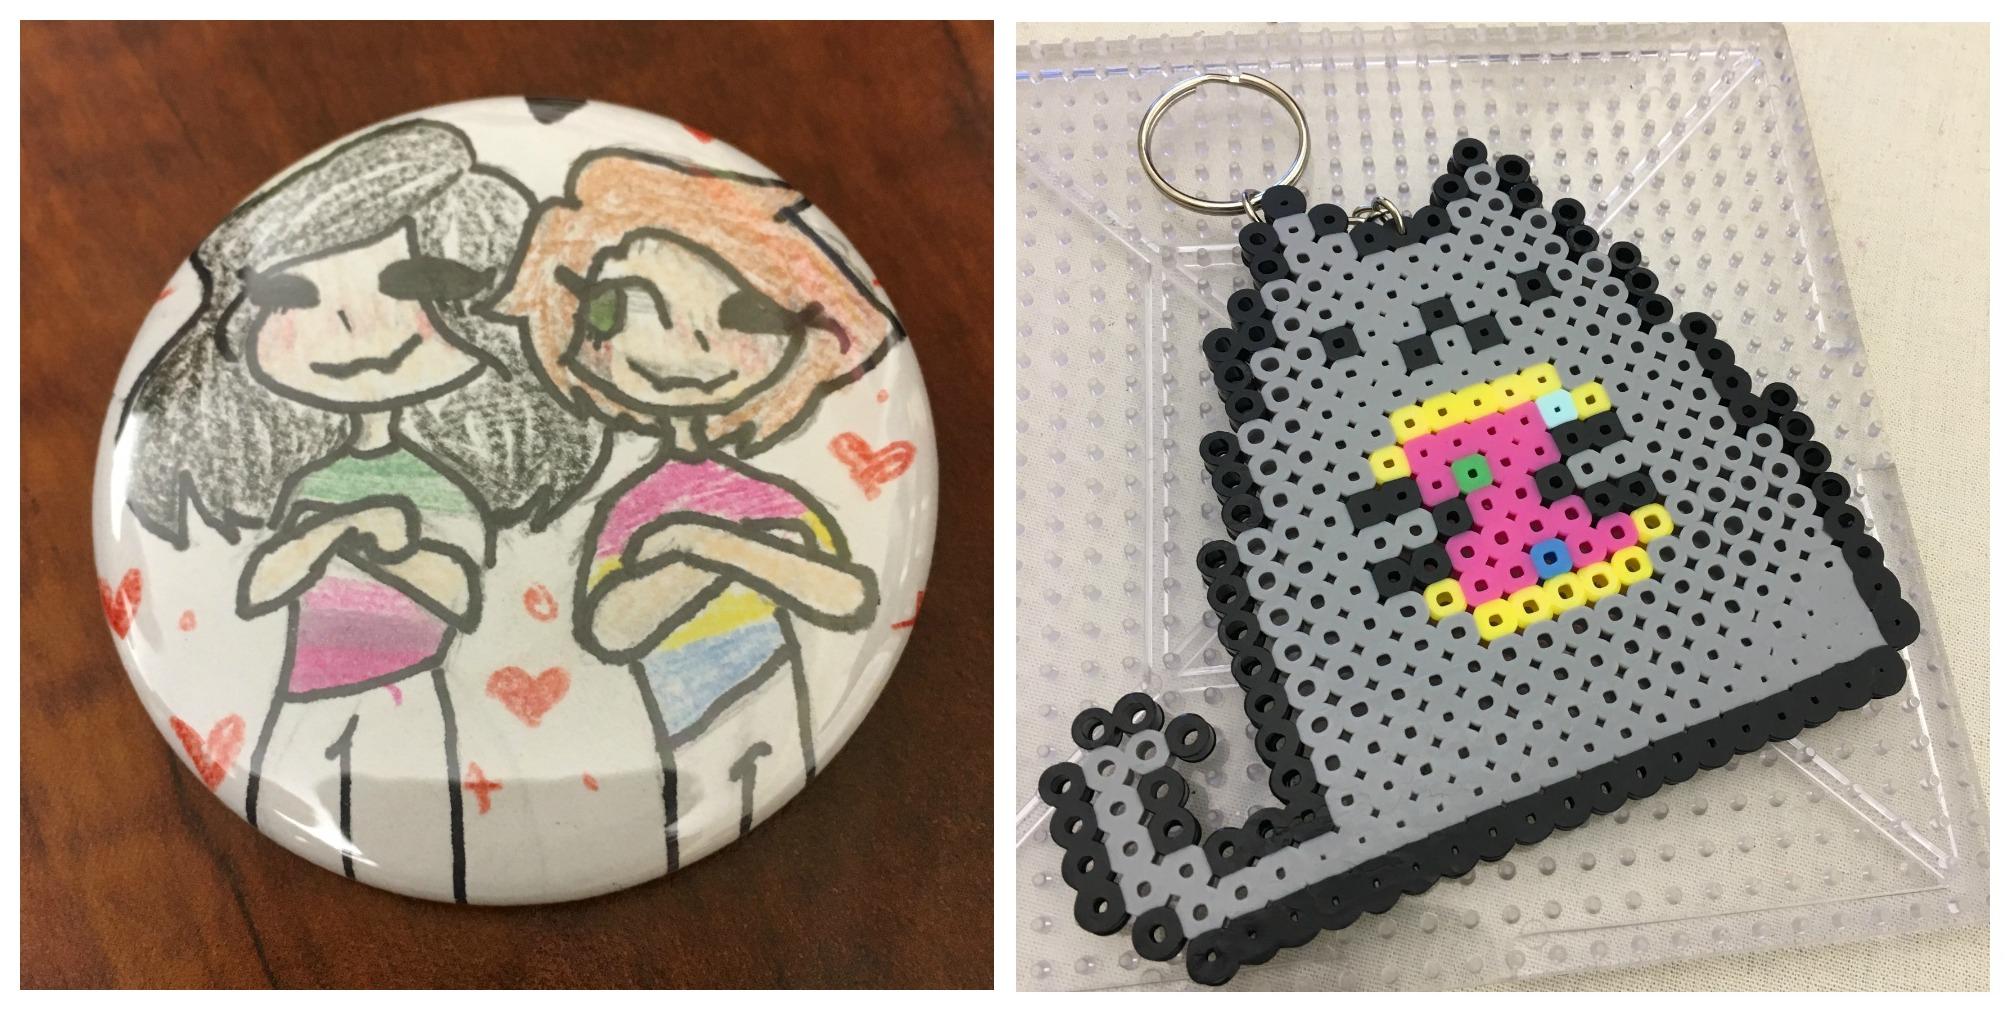 A button and Pusheen pixel art made out of perler beads